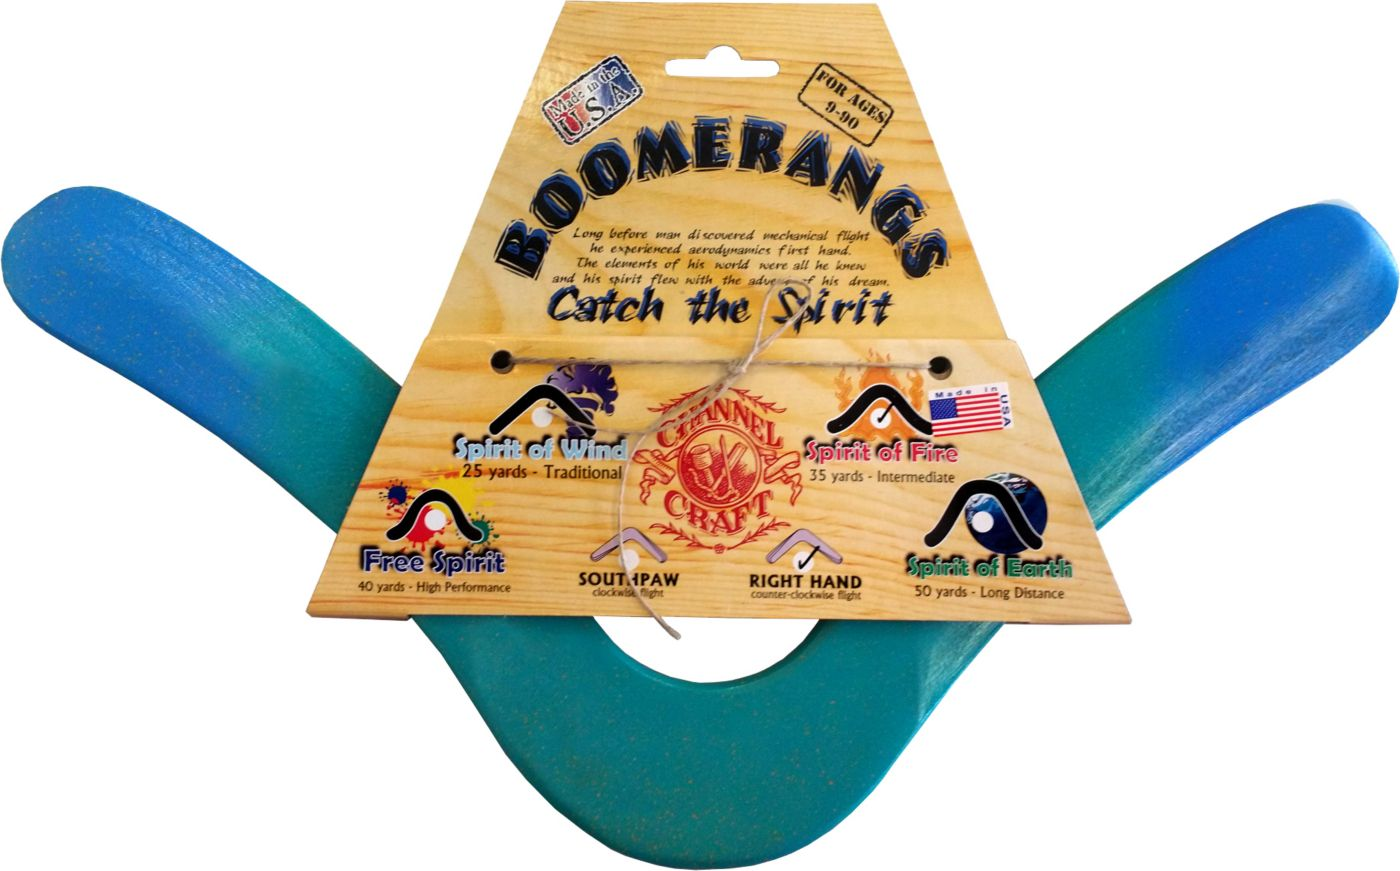 Channel Craft Graffiti Fire 'Rang Left-Handed Boomerang